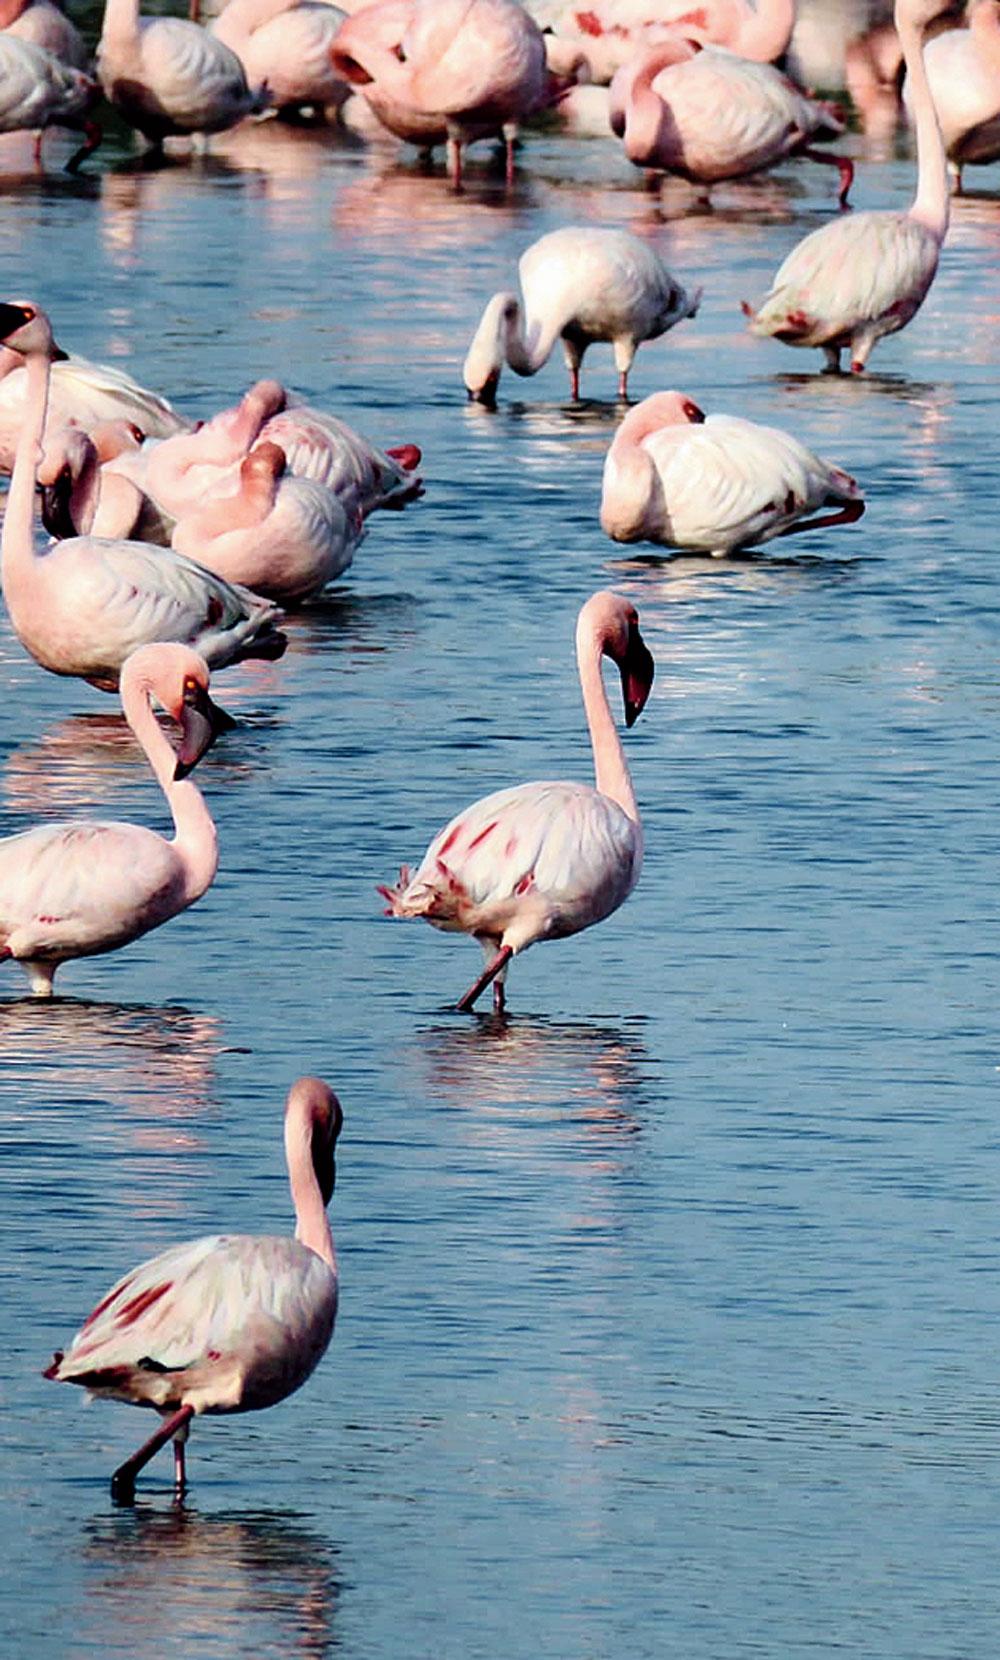 Flamingos flocked to Mumbai during the lockdown